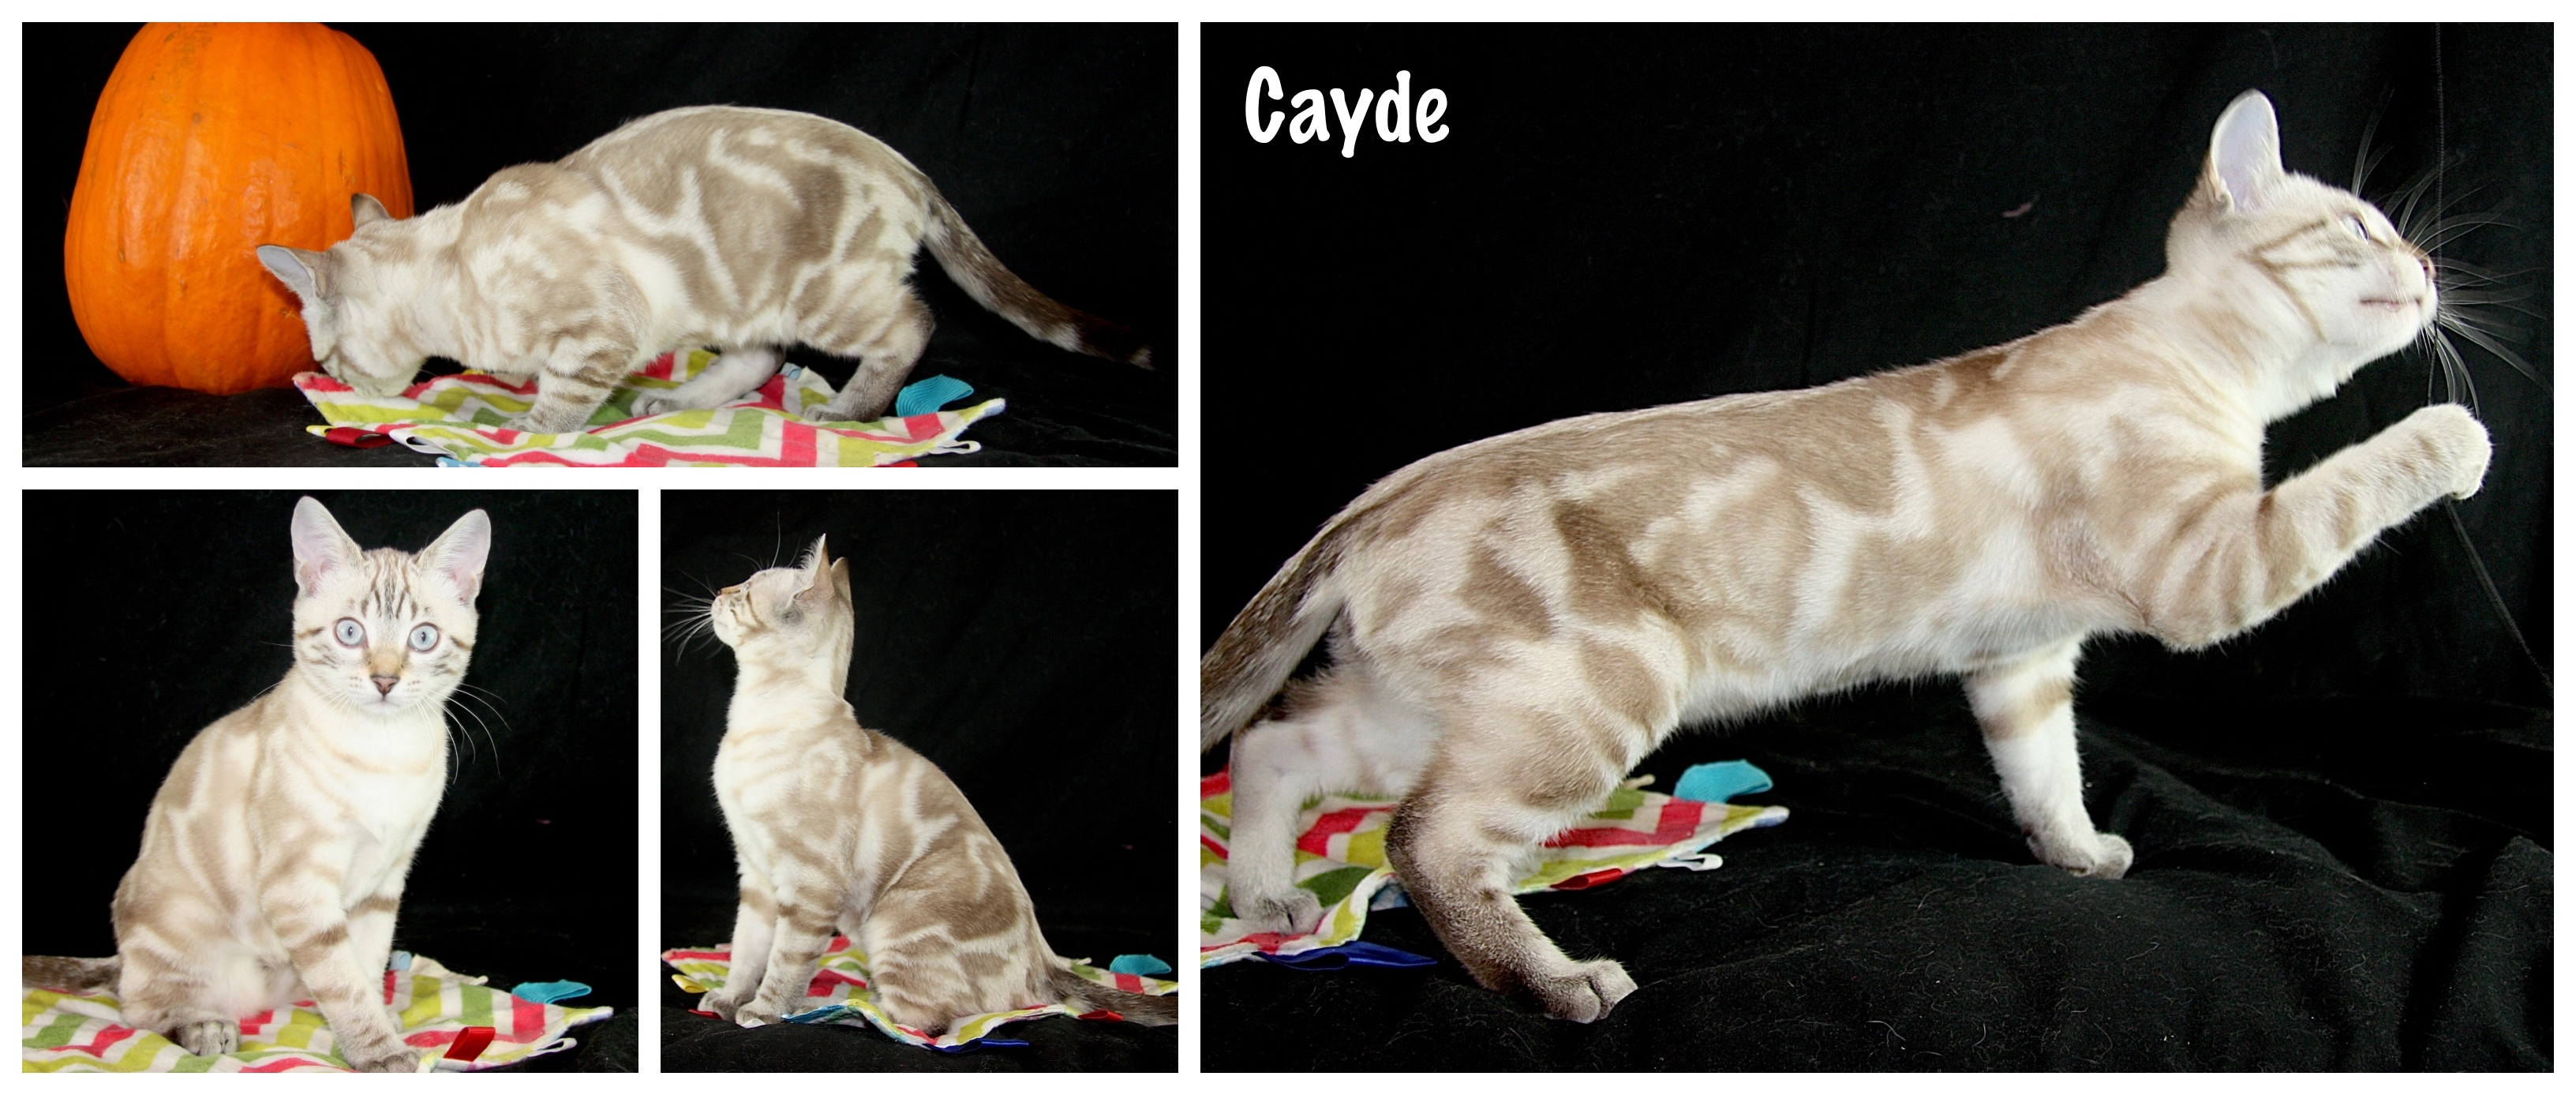 Cayde 14 weeks